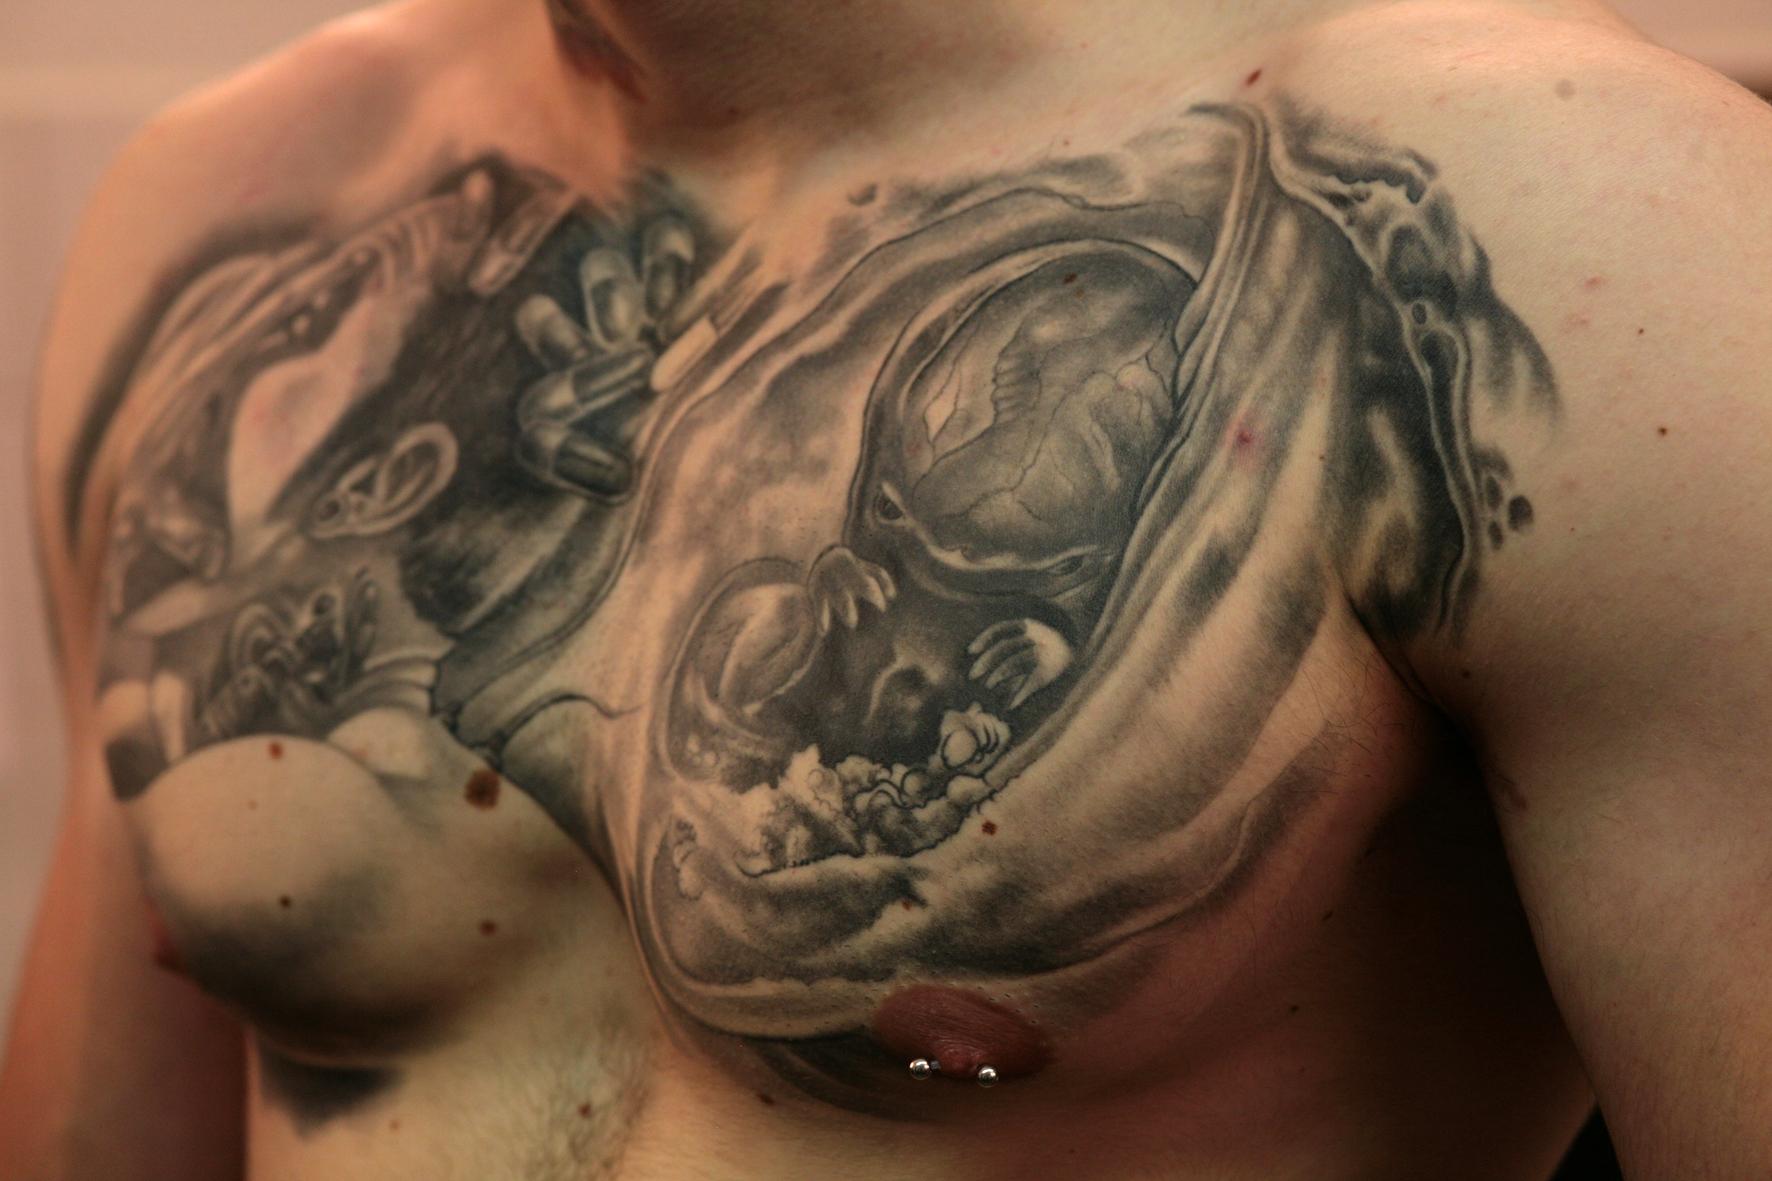 belle tatouage maori bras homme